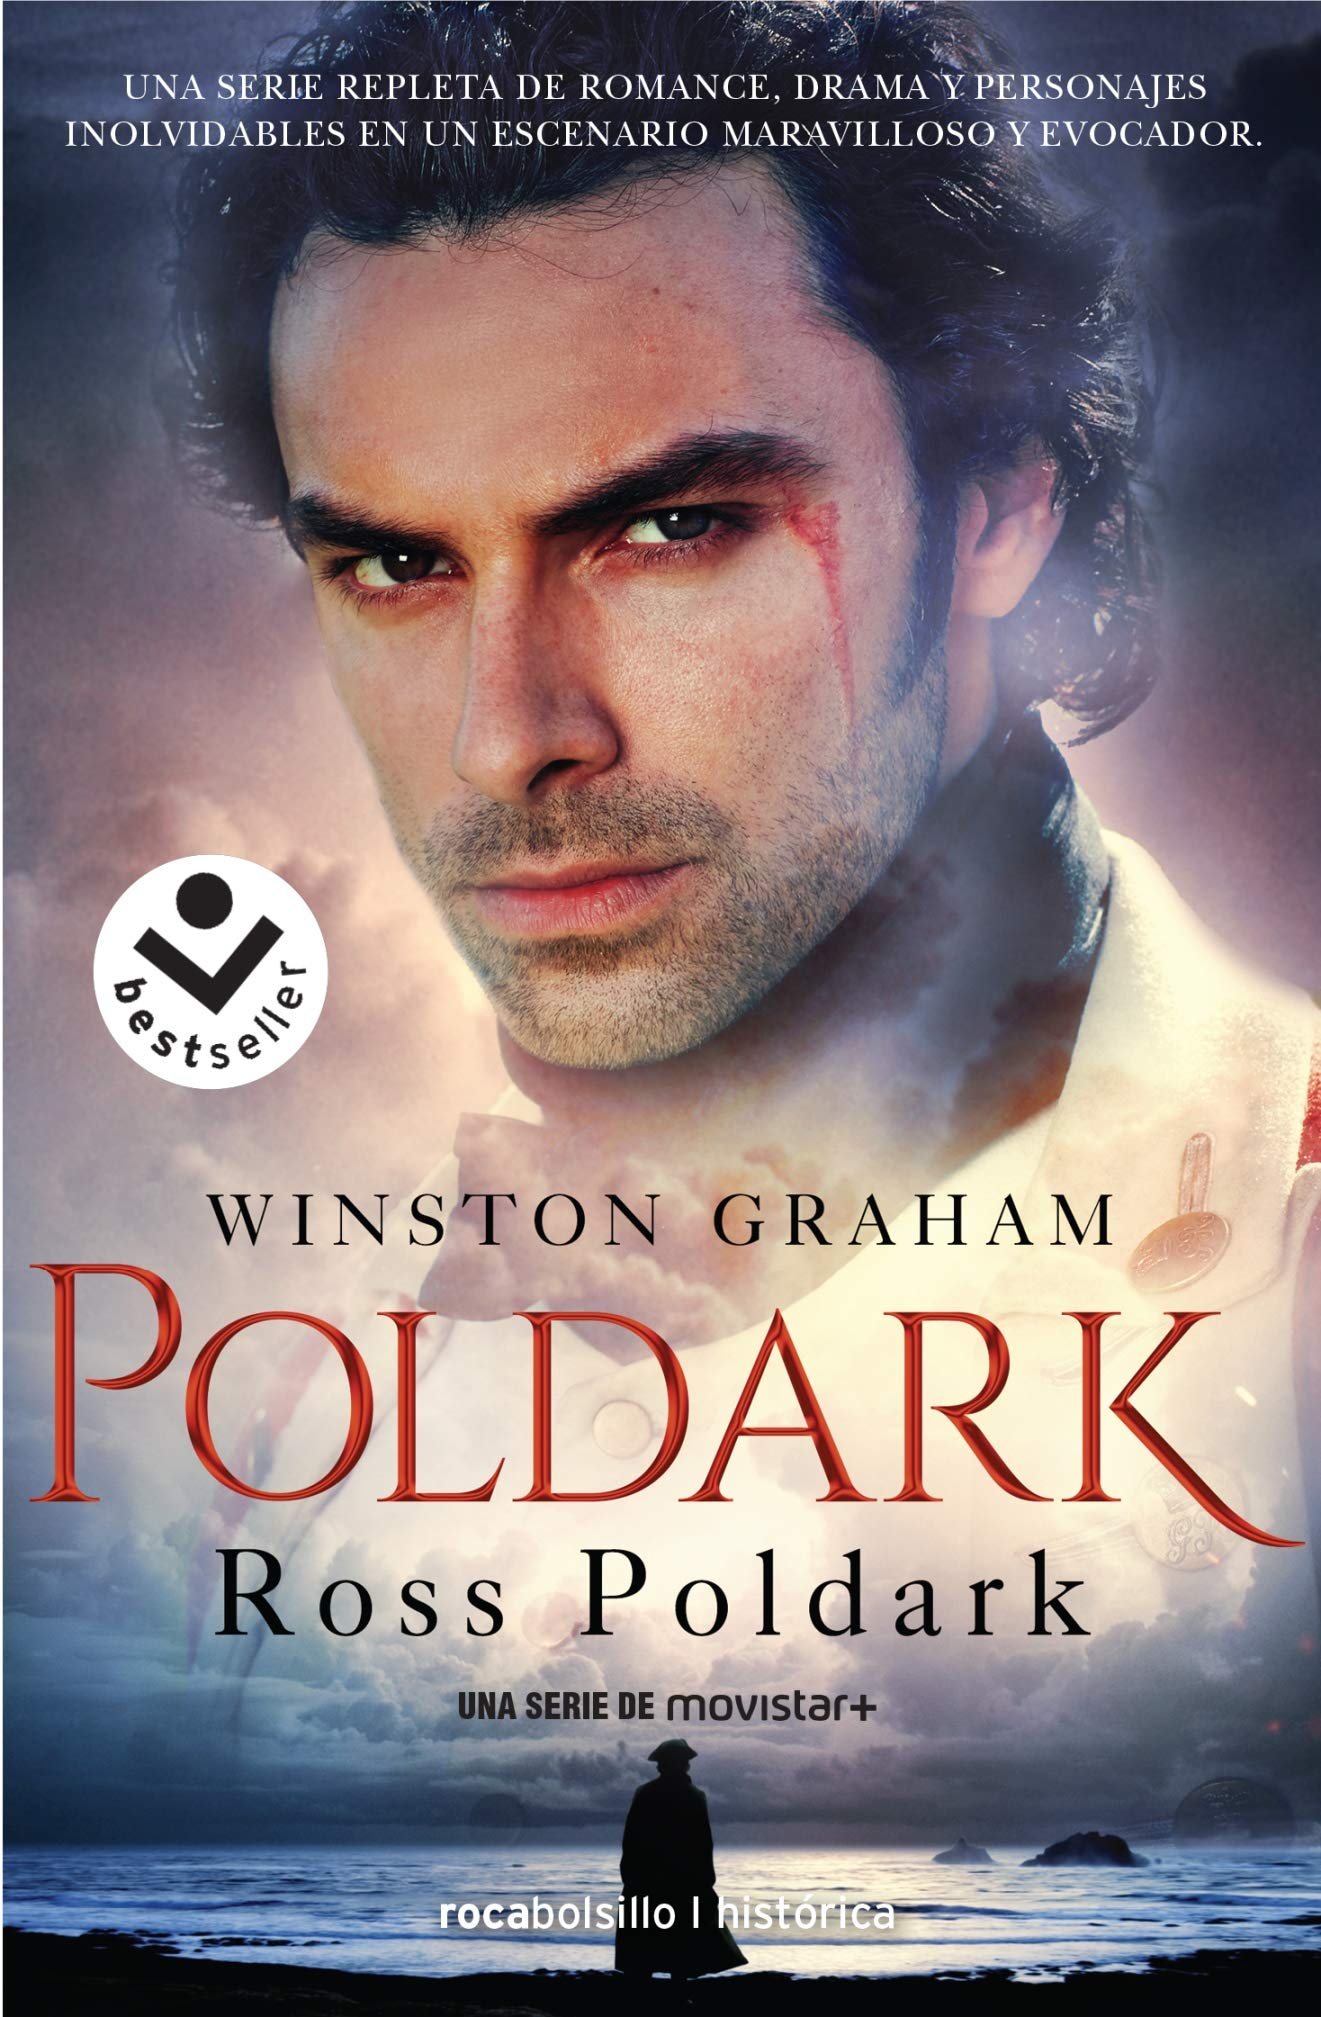 Ross Poldark (Best seller / Histórica) por Winston Graham